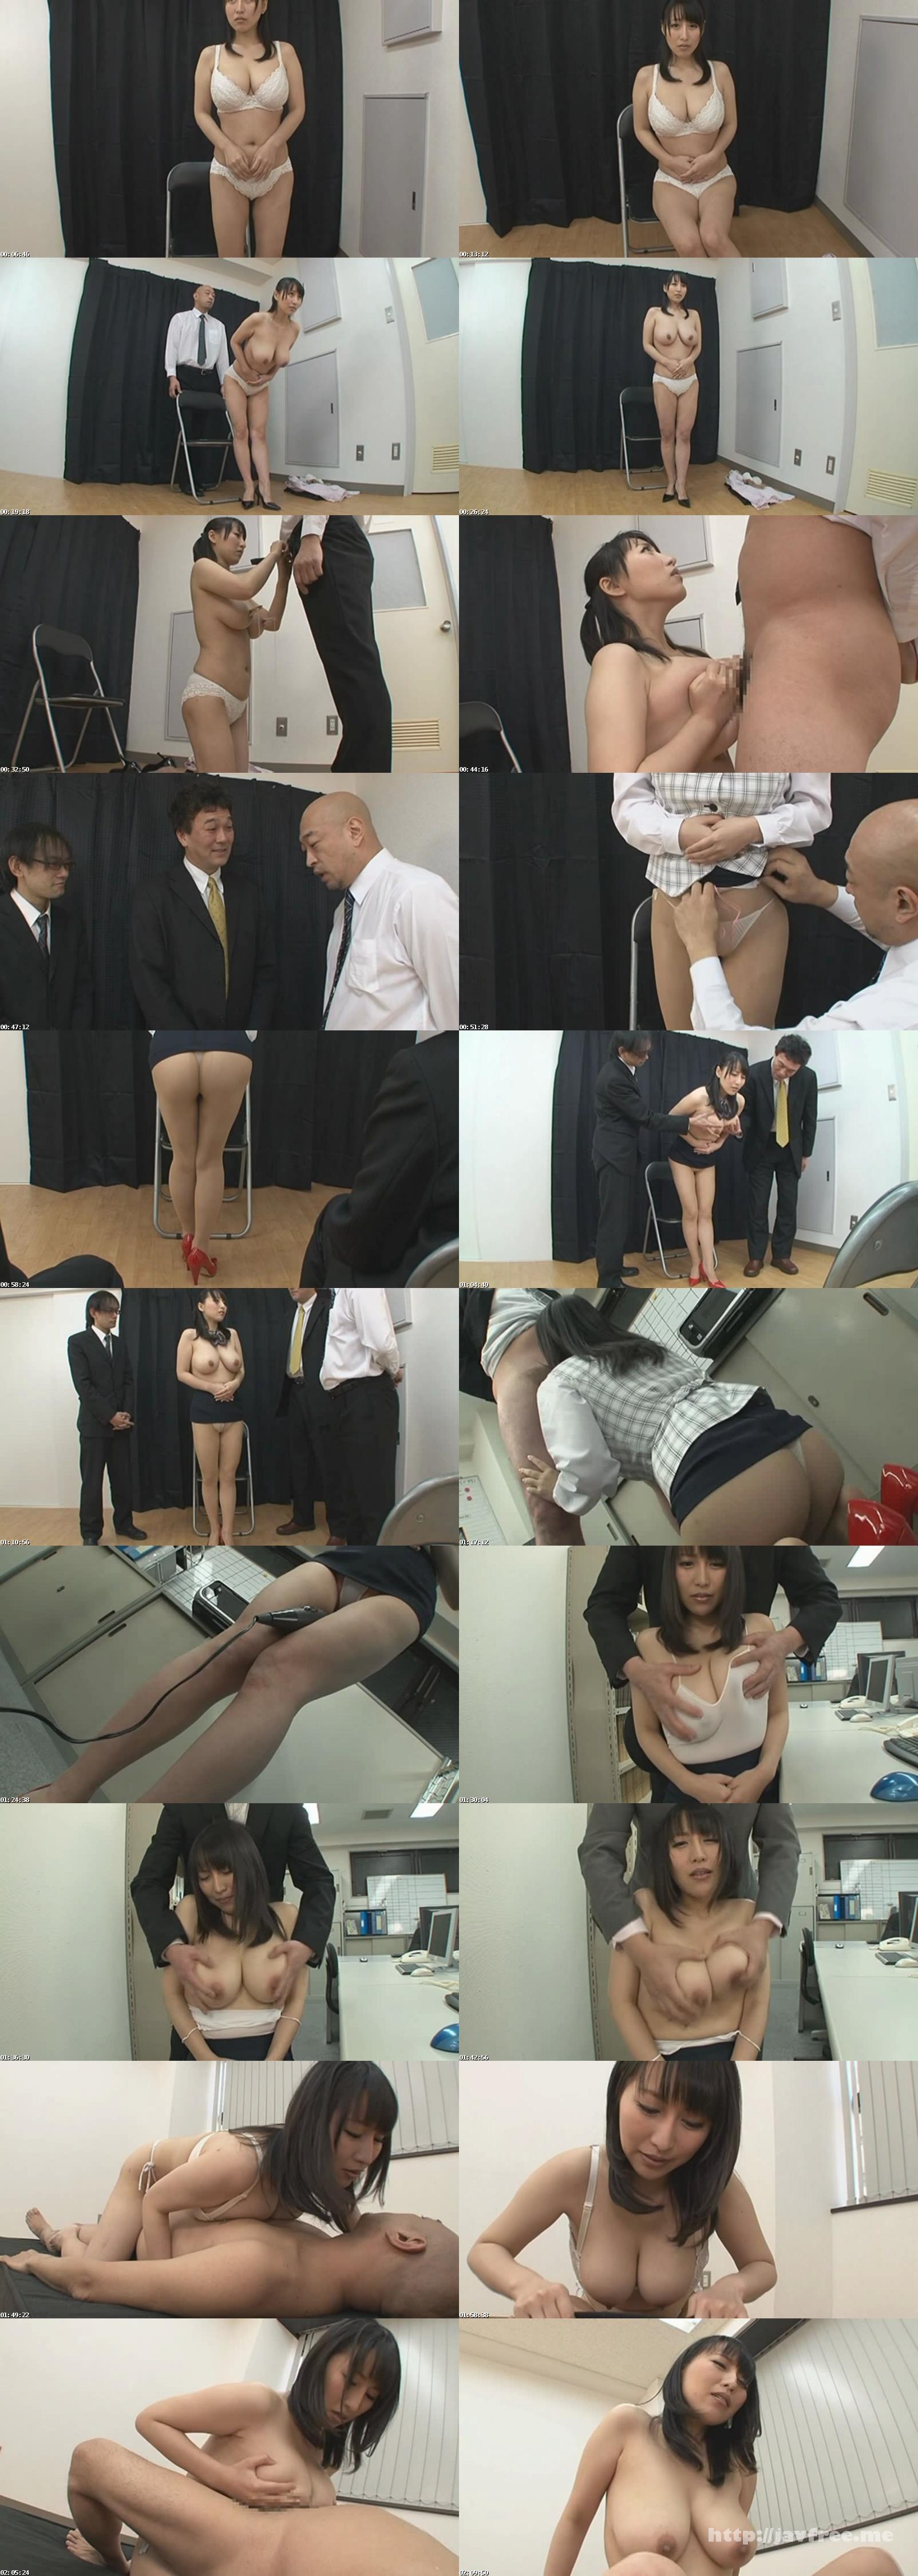 [NKD 132] 巨乳女子社員再教育プログラム2 星咲優菜 星咲優菜 nkd